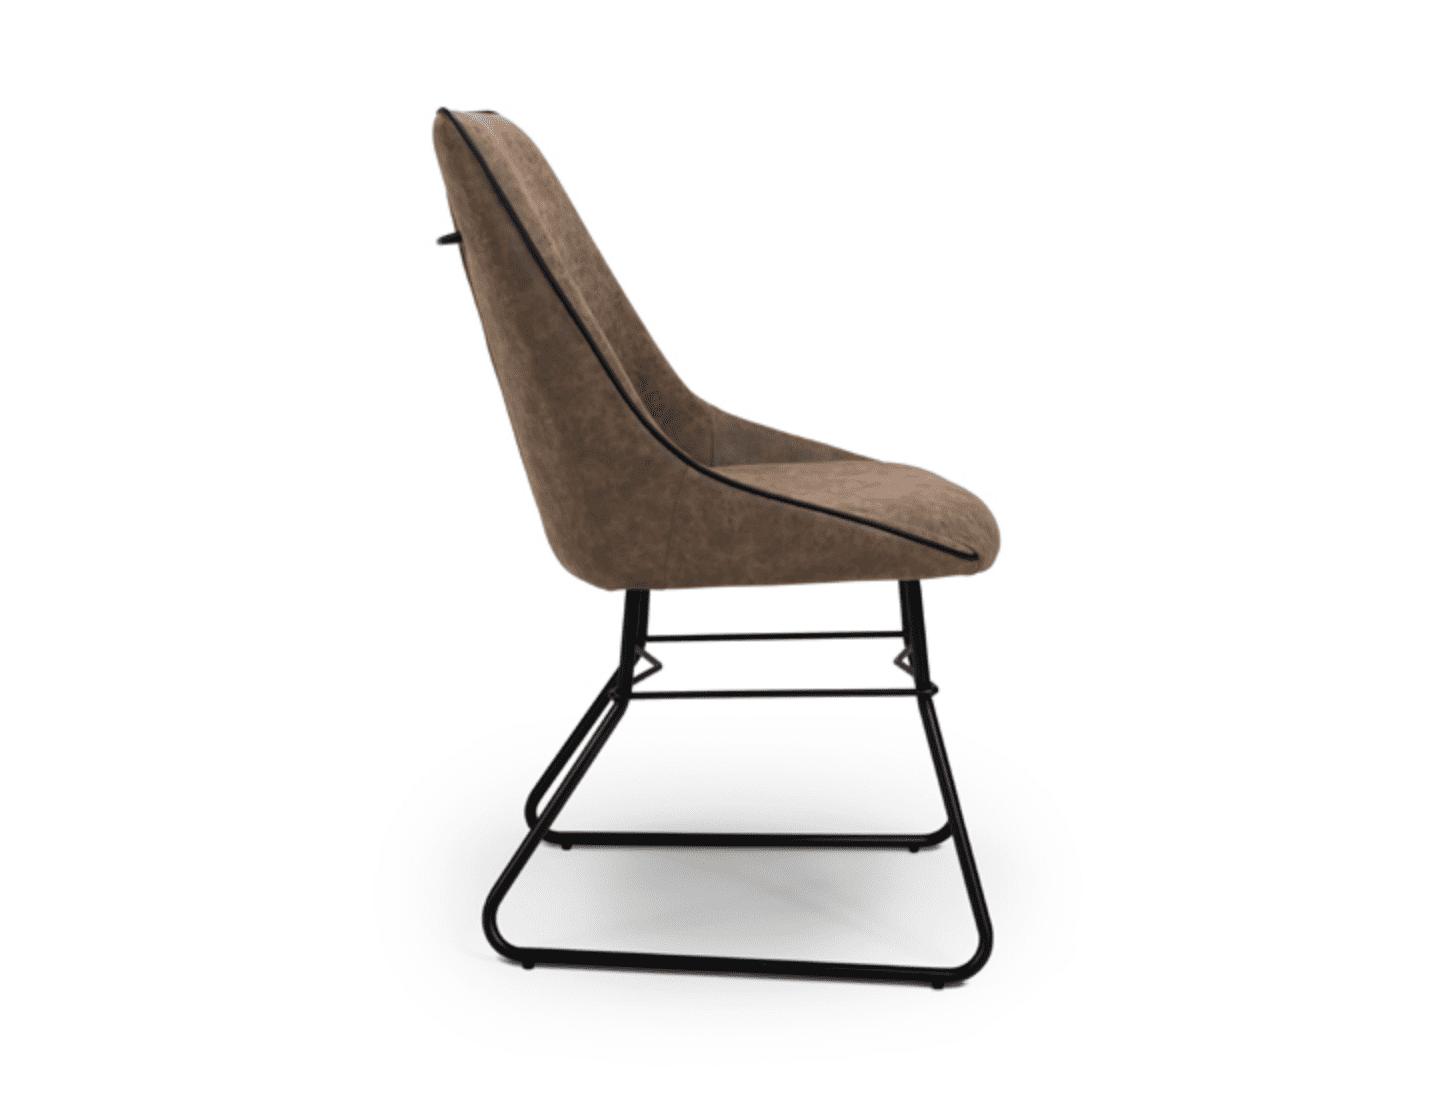 Cooper chair wax tan side